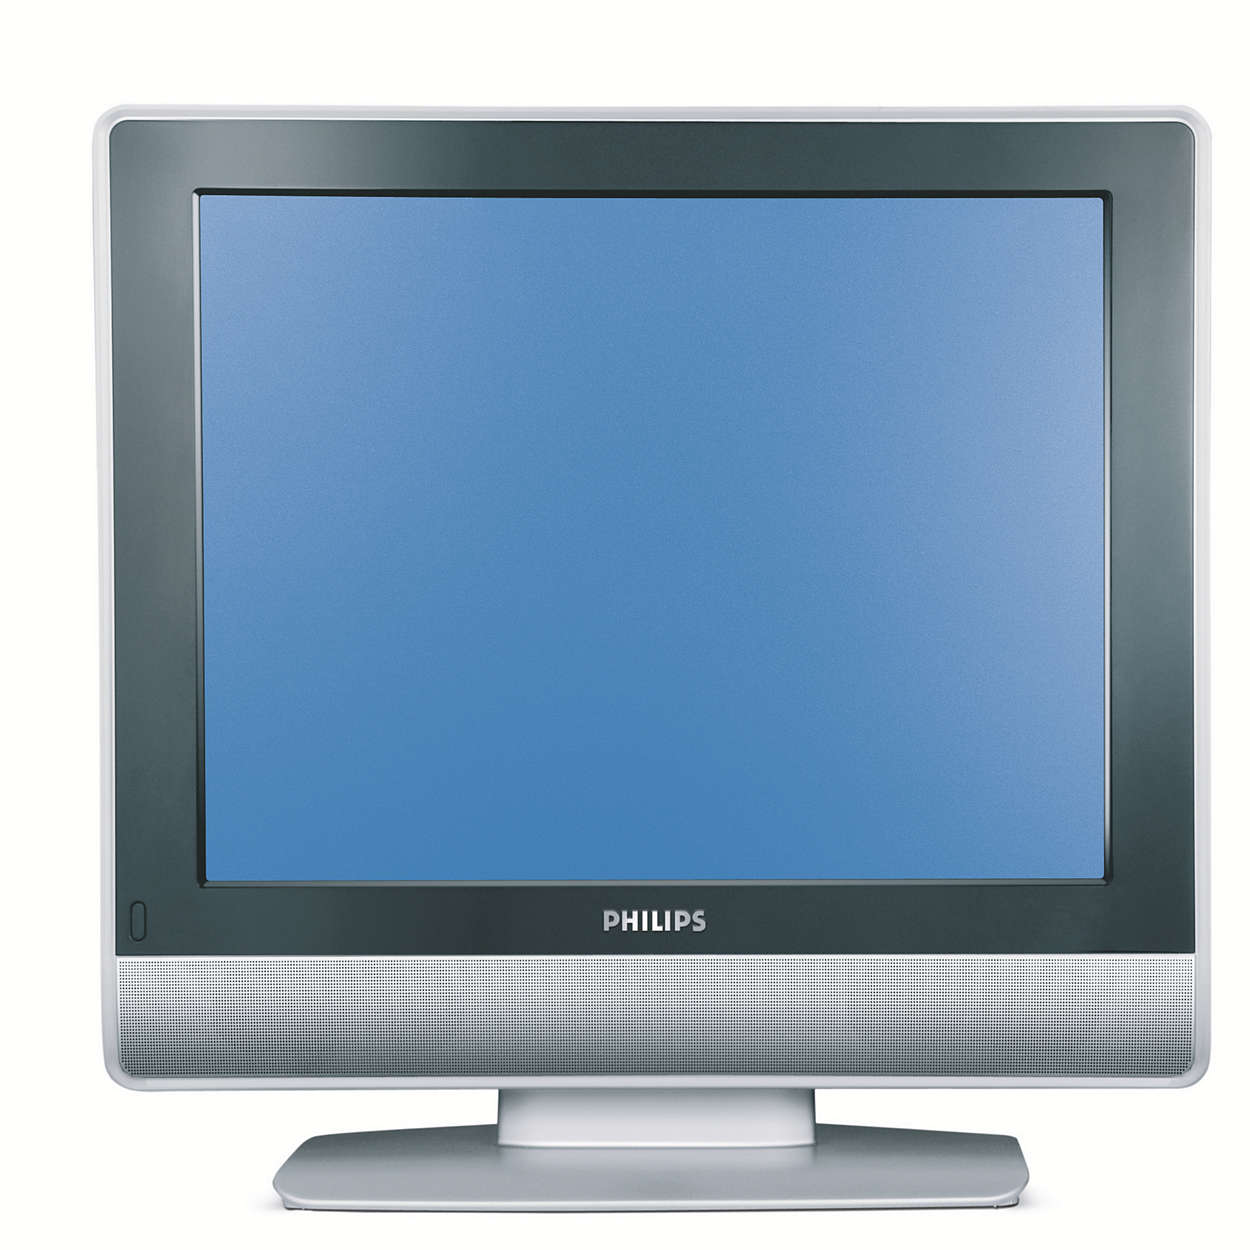 Płaski telewizor dla hoteli